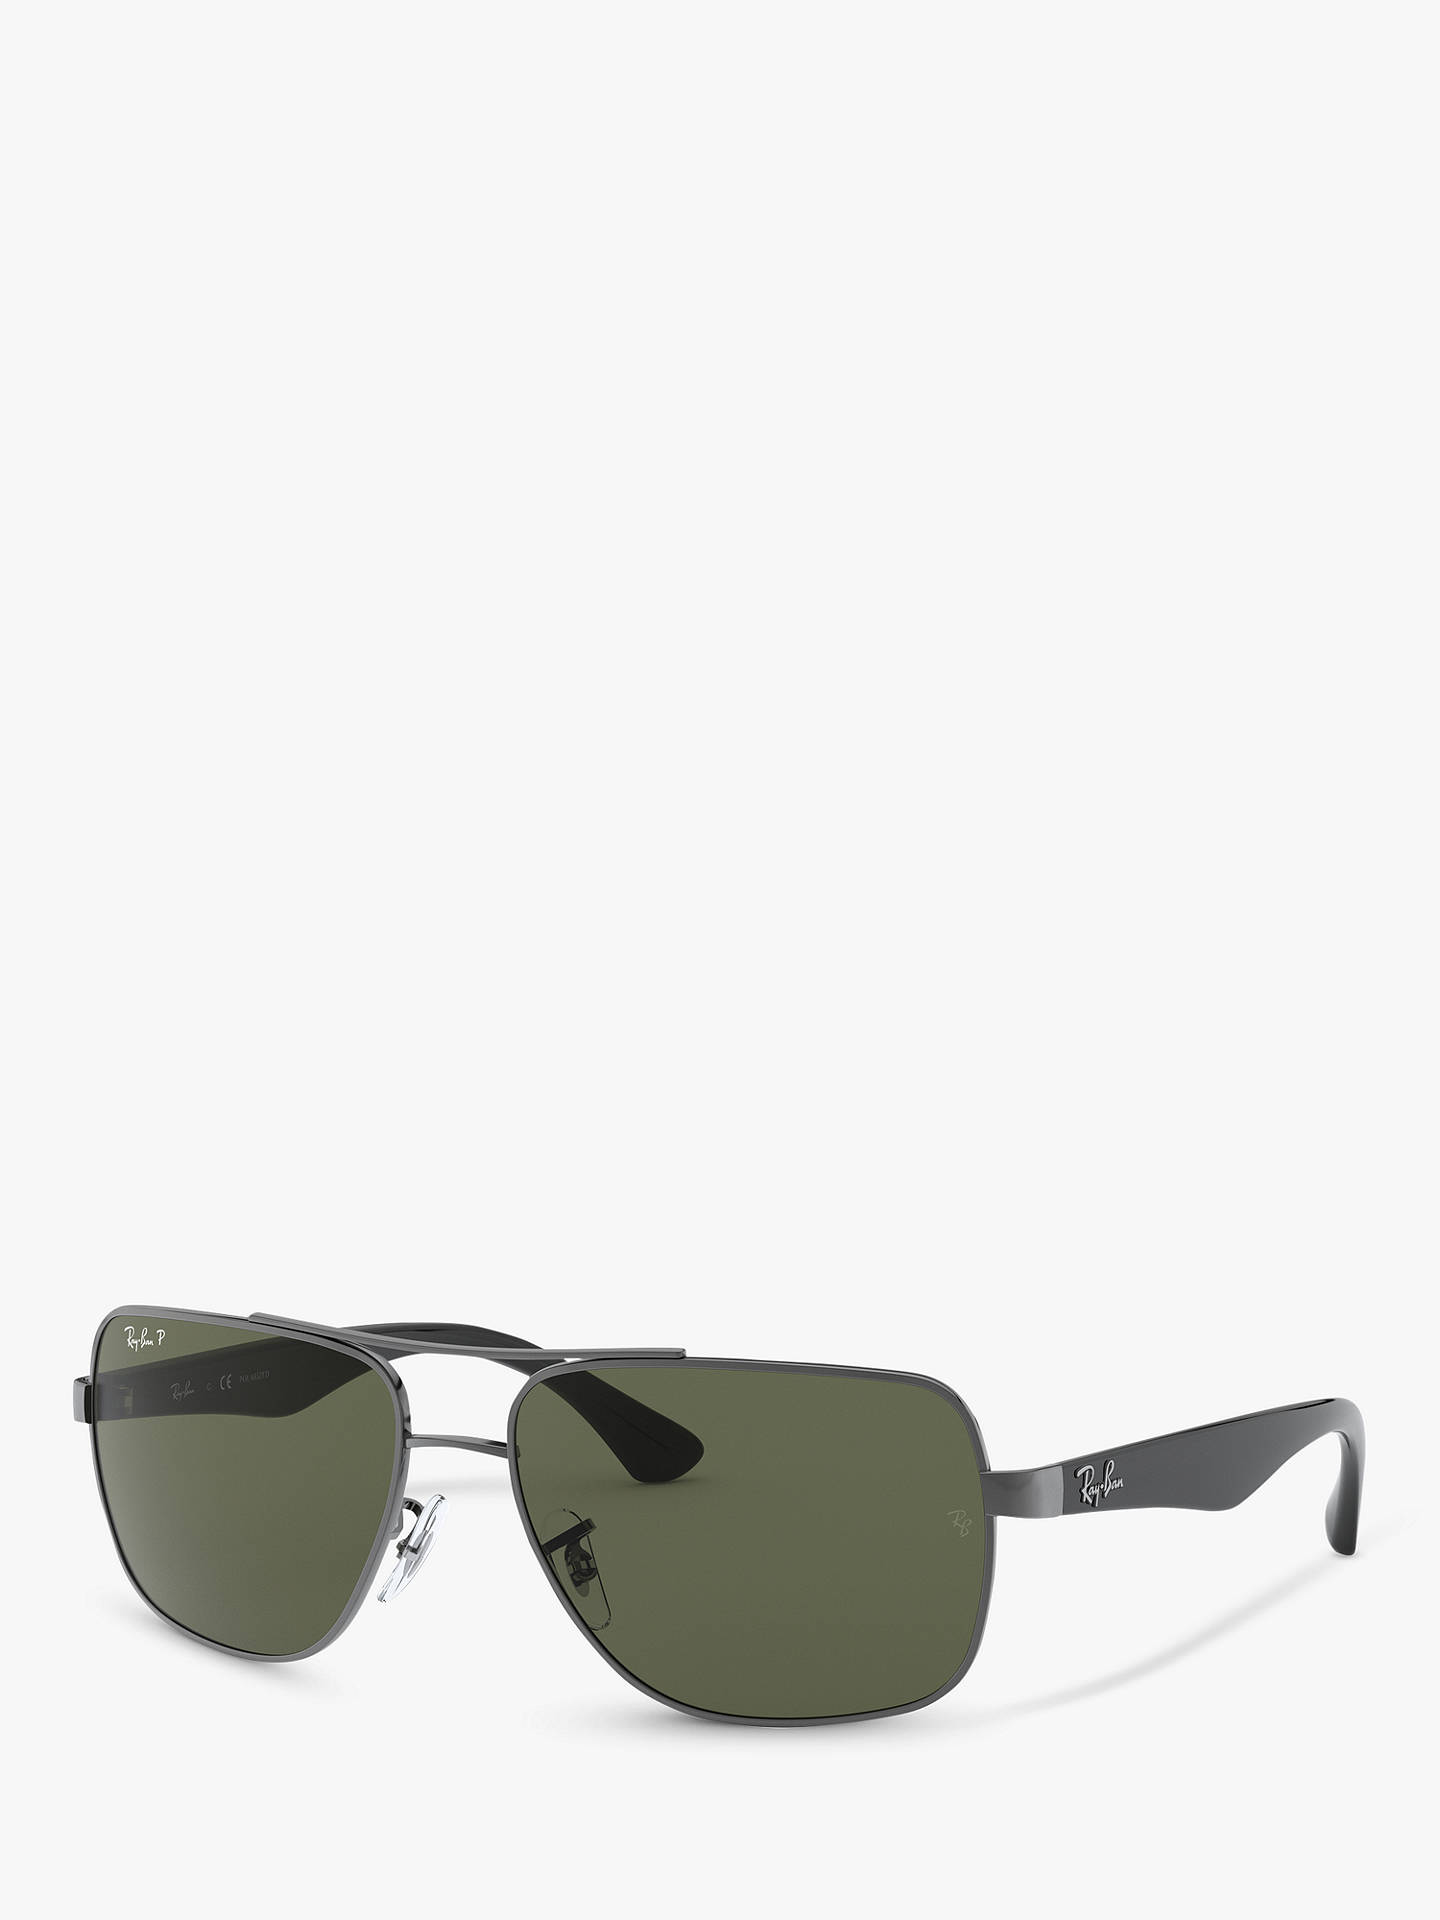 d312aaee1e BuyRay-Ban RB3483 Highstreet Polarised Square Sunglasses